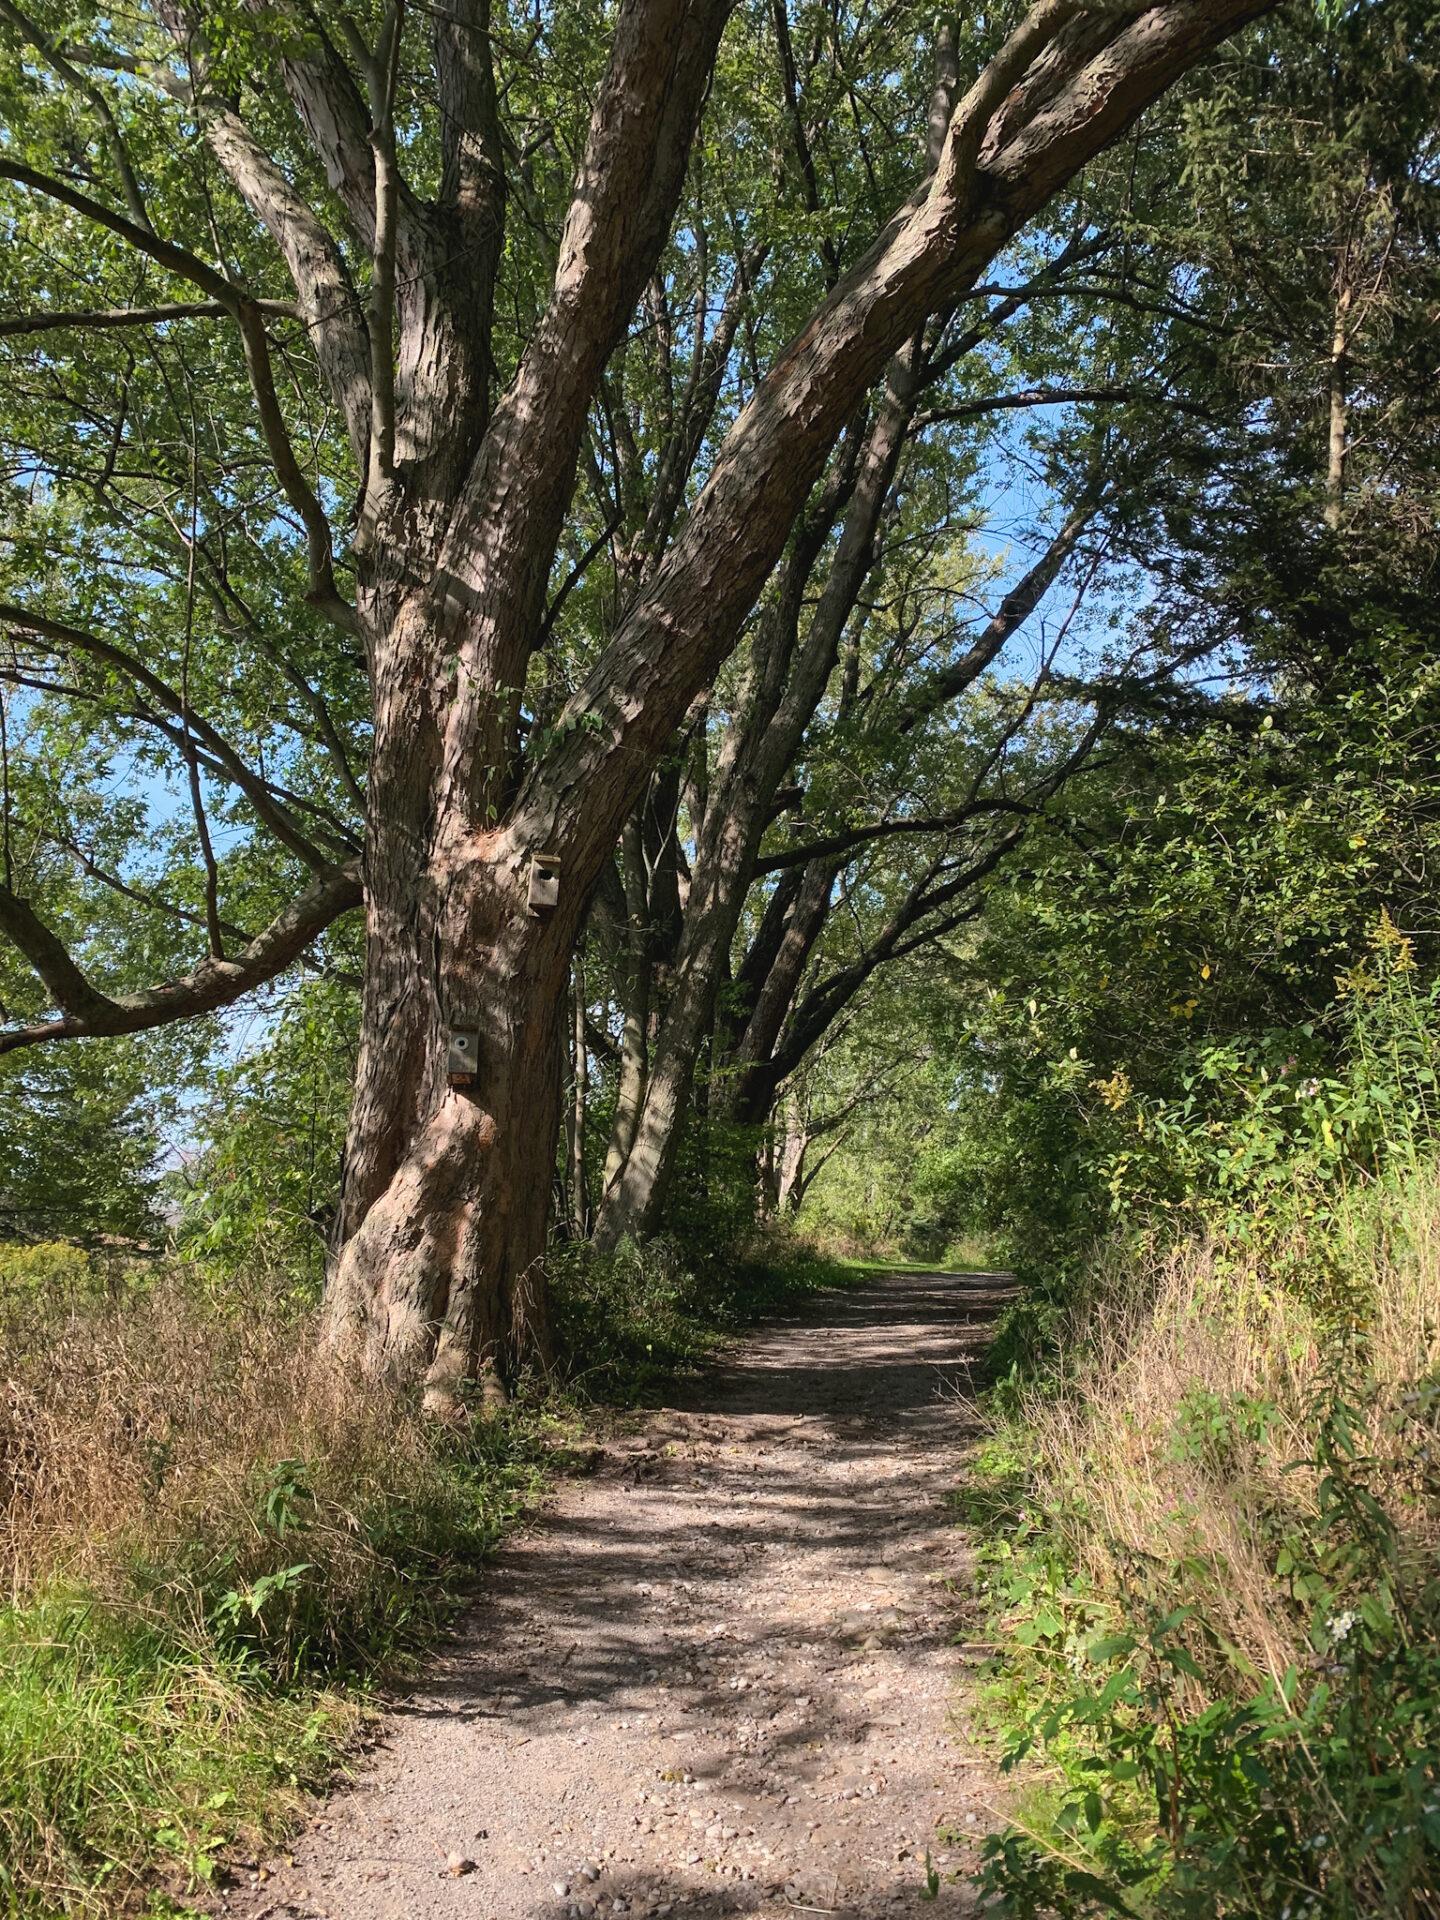 Hiking at the McLaughlin Bay Wildlife Reserve in Oshawa, Ontario